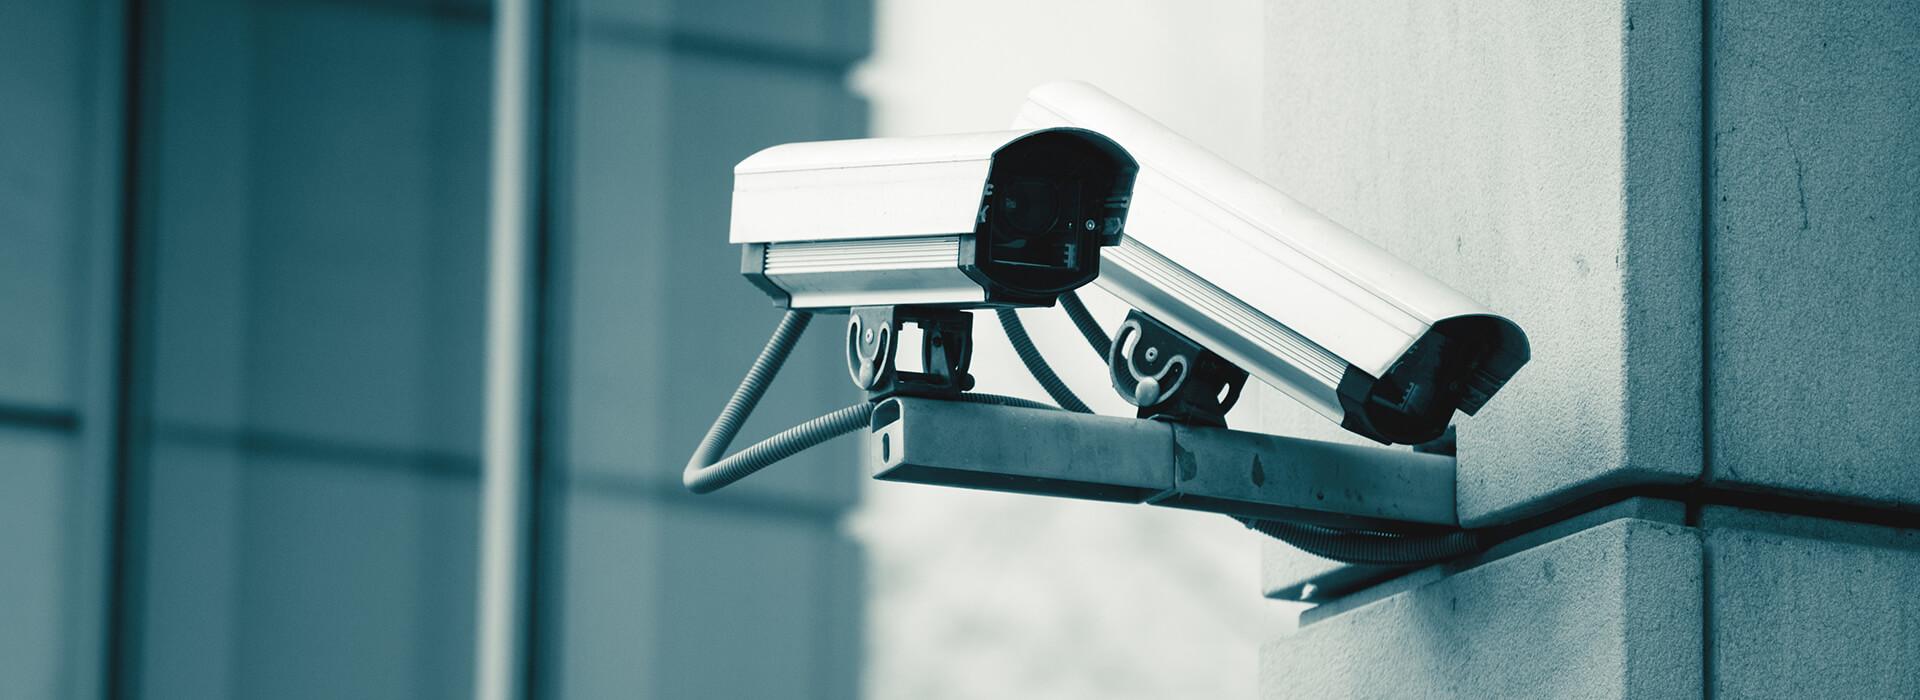 videosurveillance-parlophone-schaerbeek